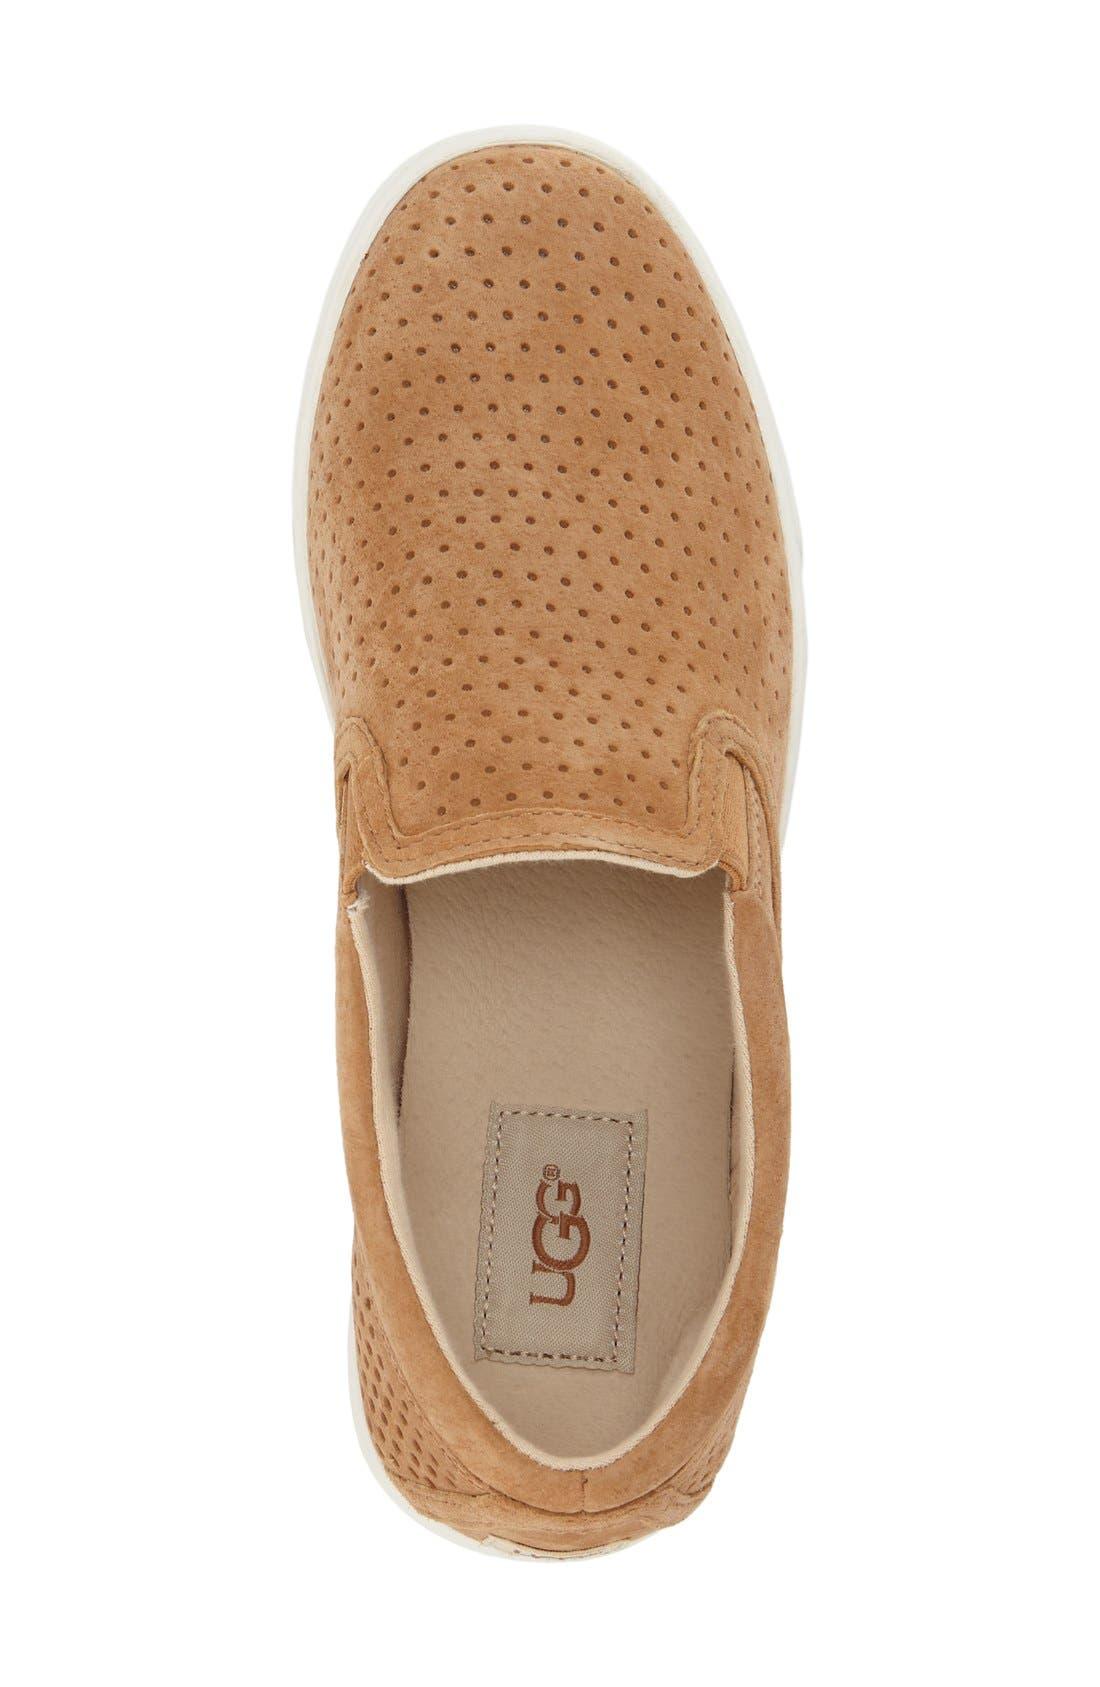 Alternate Image 3  - UGG® 'Fierce Geo' Perforated Slip-On Sneaker (Women)